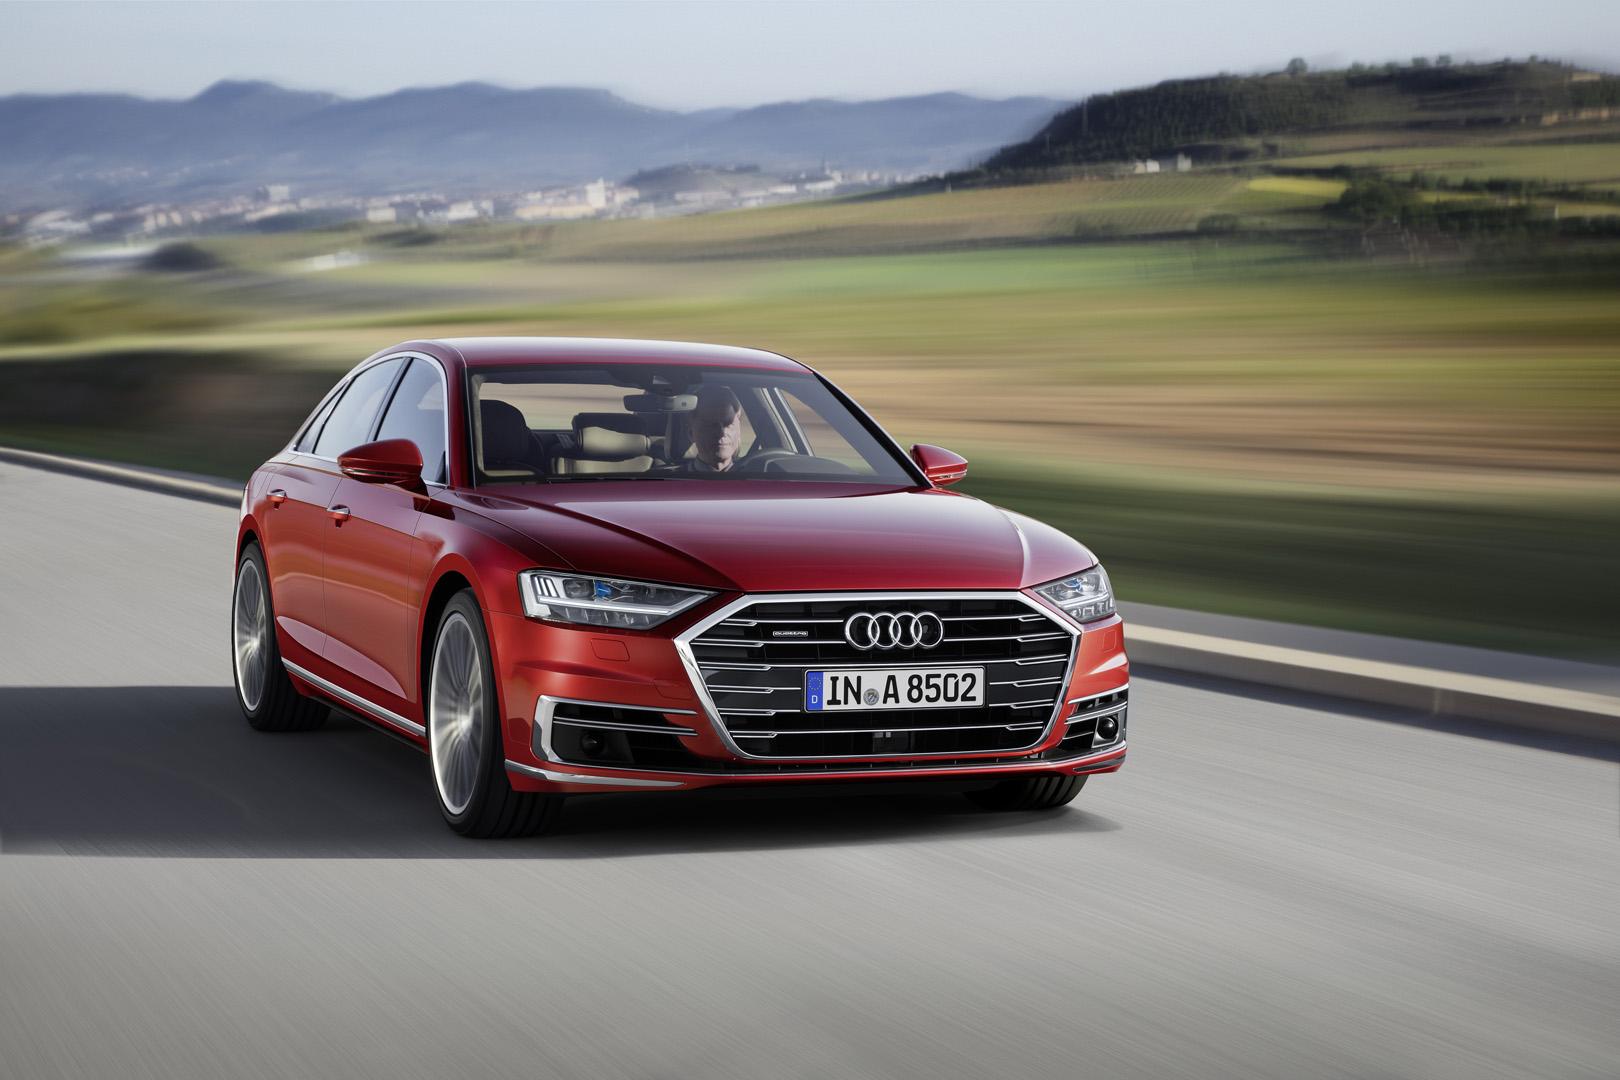 2018 Audi A8 1 9